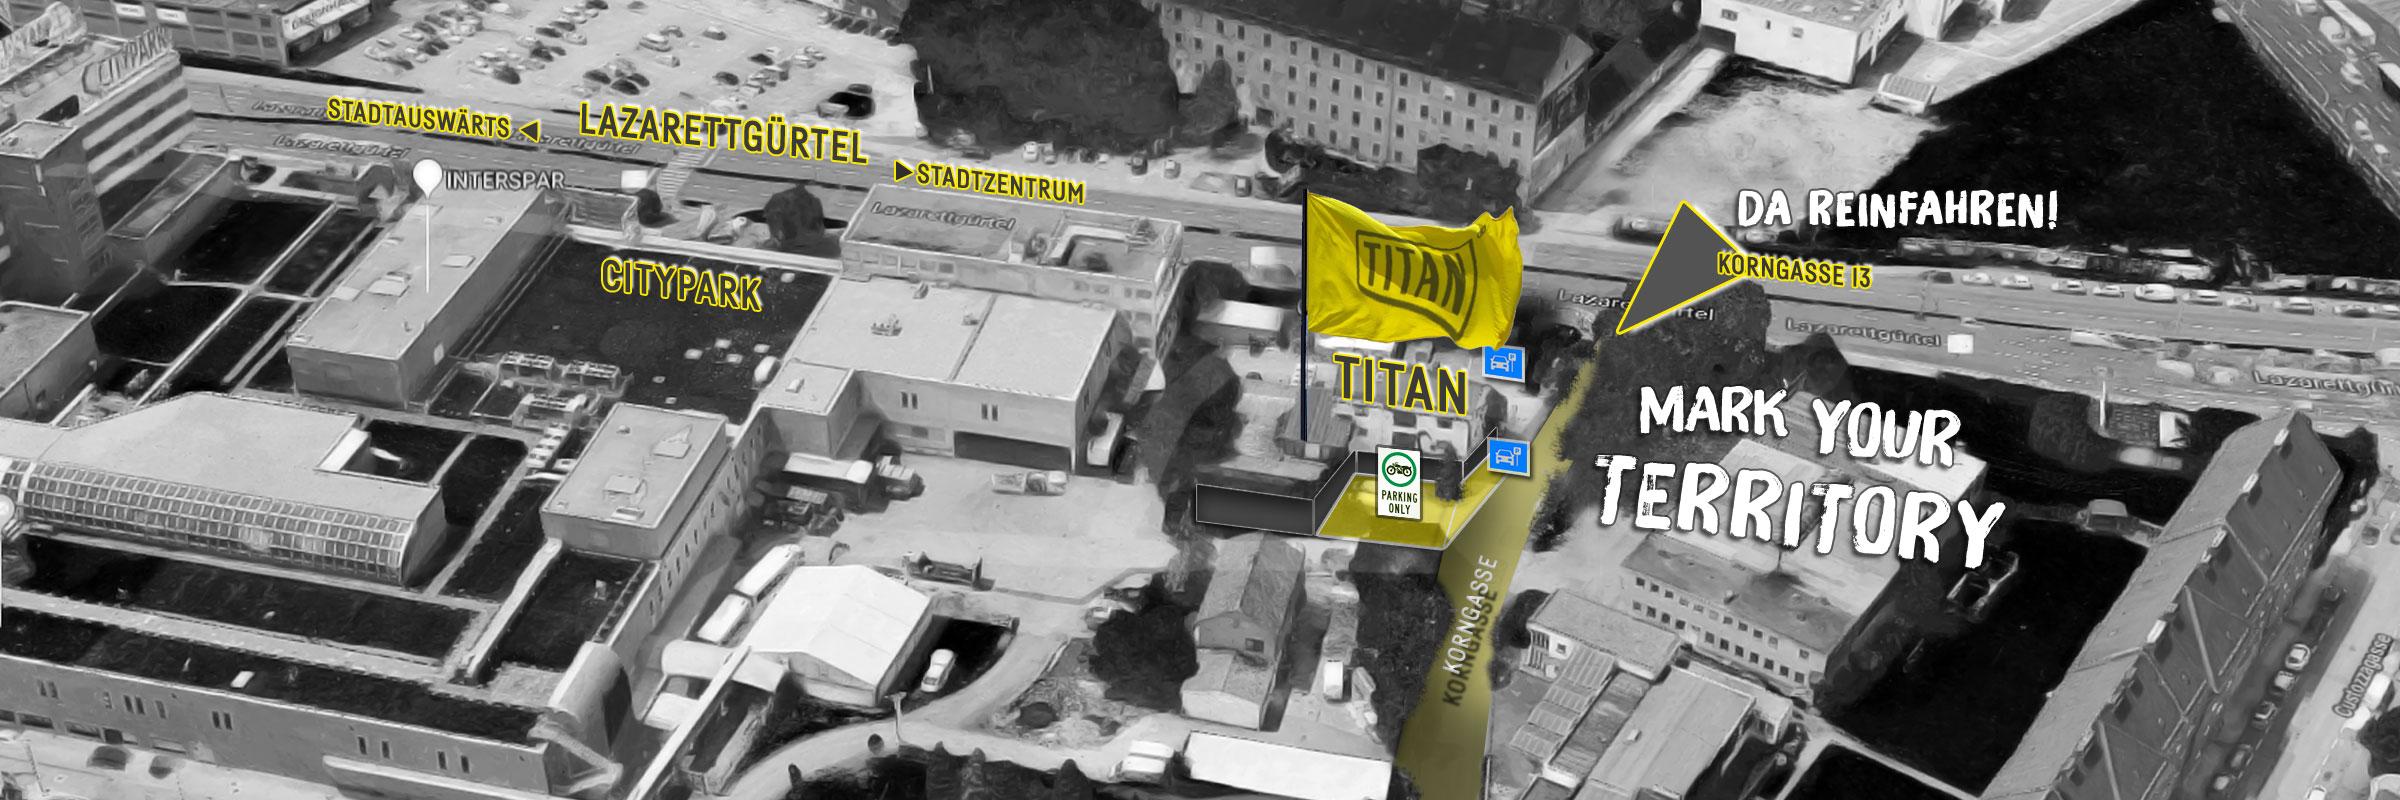 00_Titan-Kontakt-Anfahrt-Impressum-Korngasse13-Graz-Cafe-Racer_Custom-Bike_Motorrad-Umbau